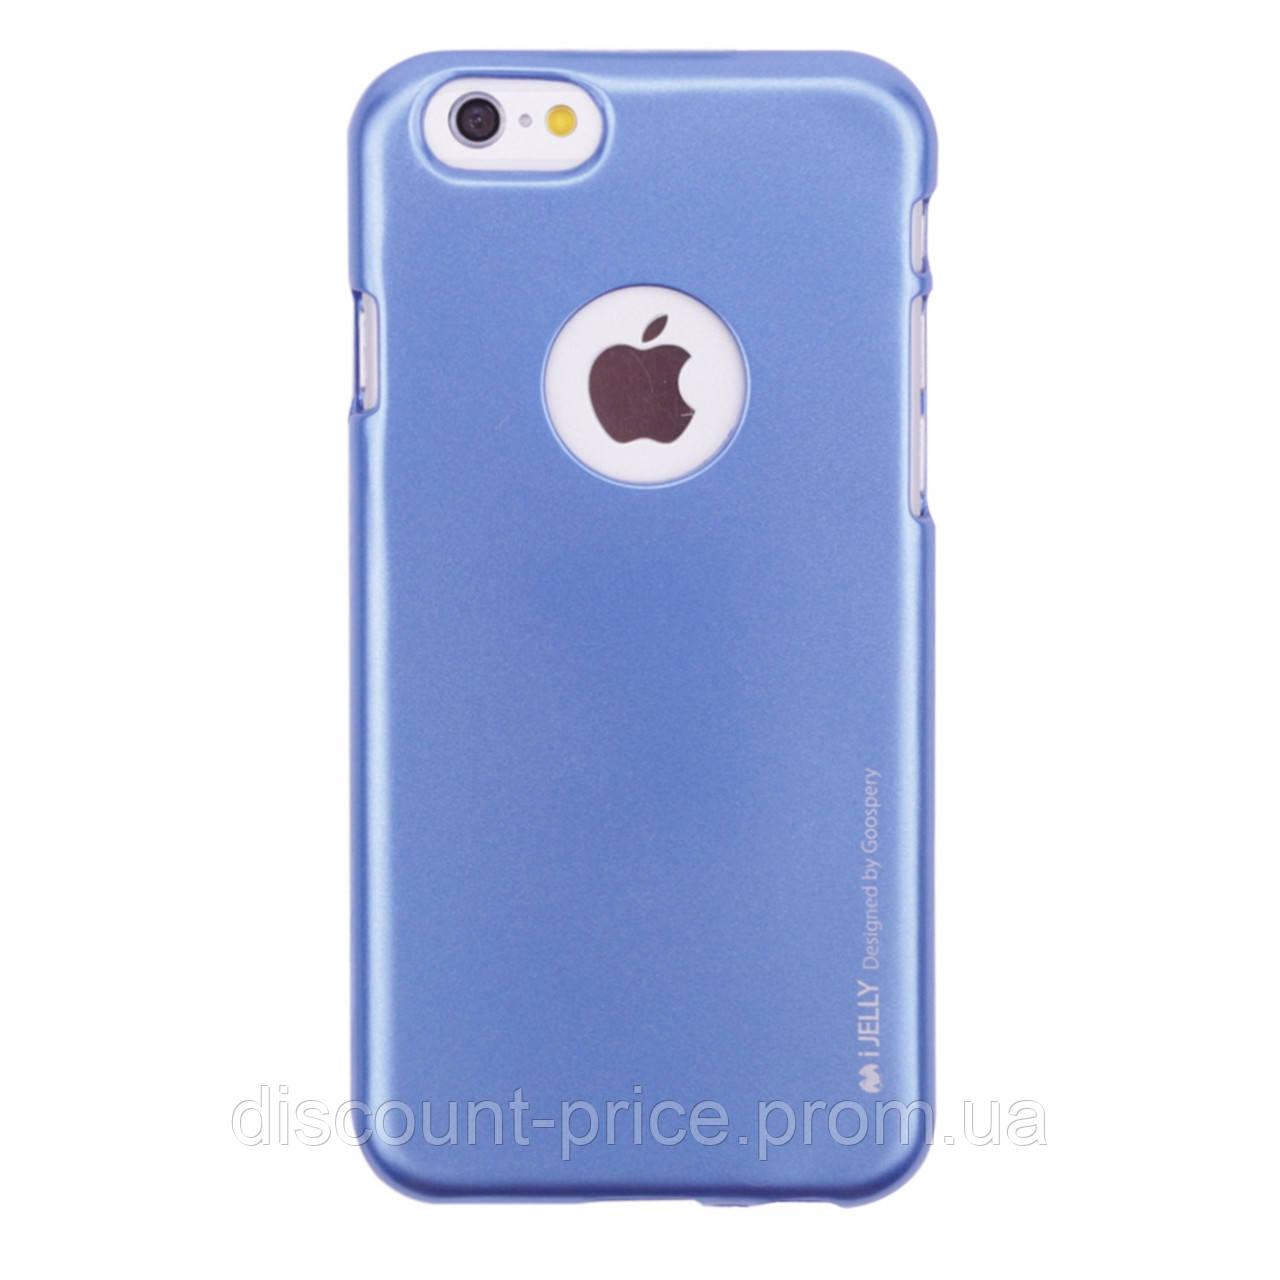 "TPU чехол Mercury iJelly Metal series для Apple iPhone 6s (4.7"") Синий (00000015011.1_50)"